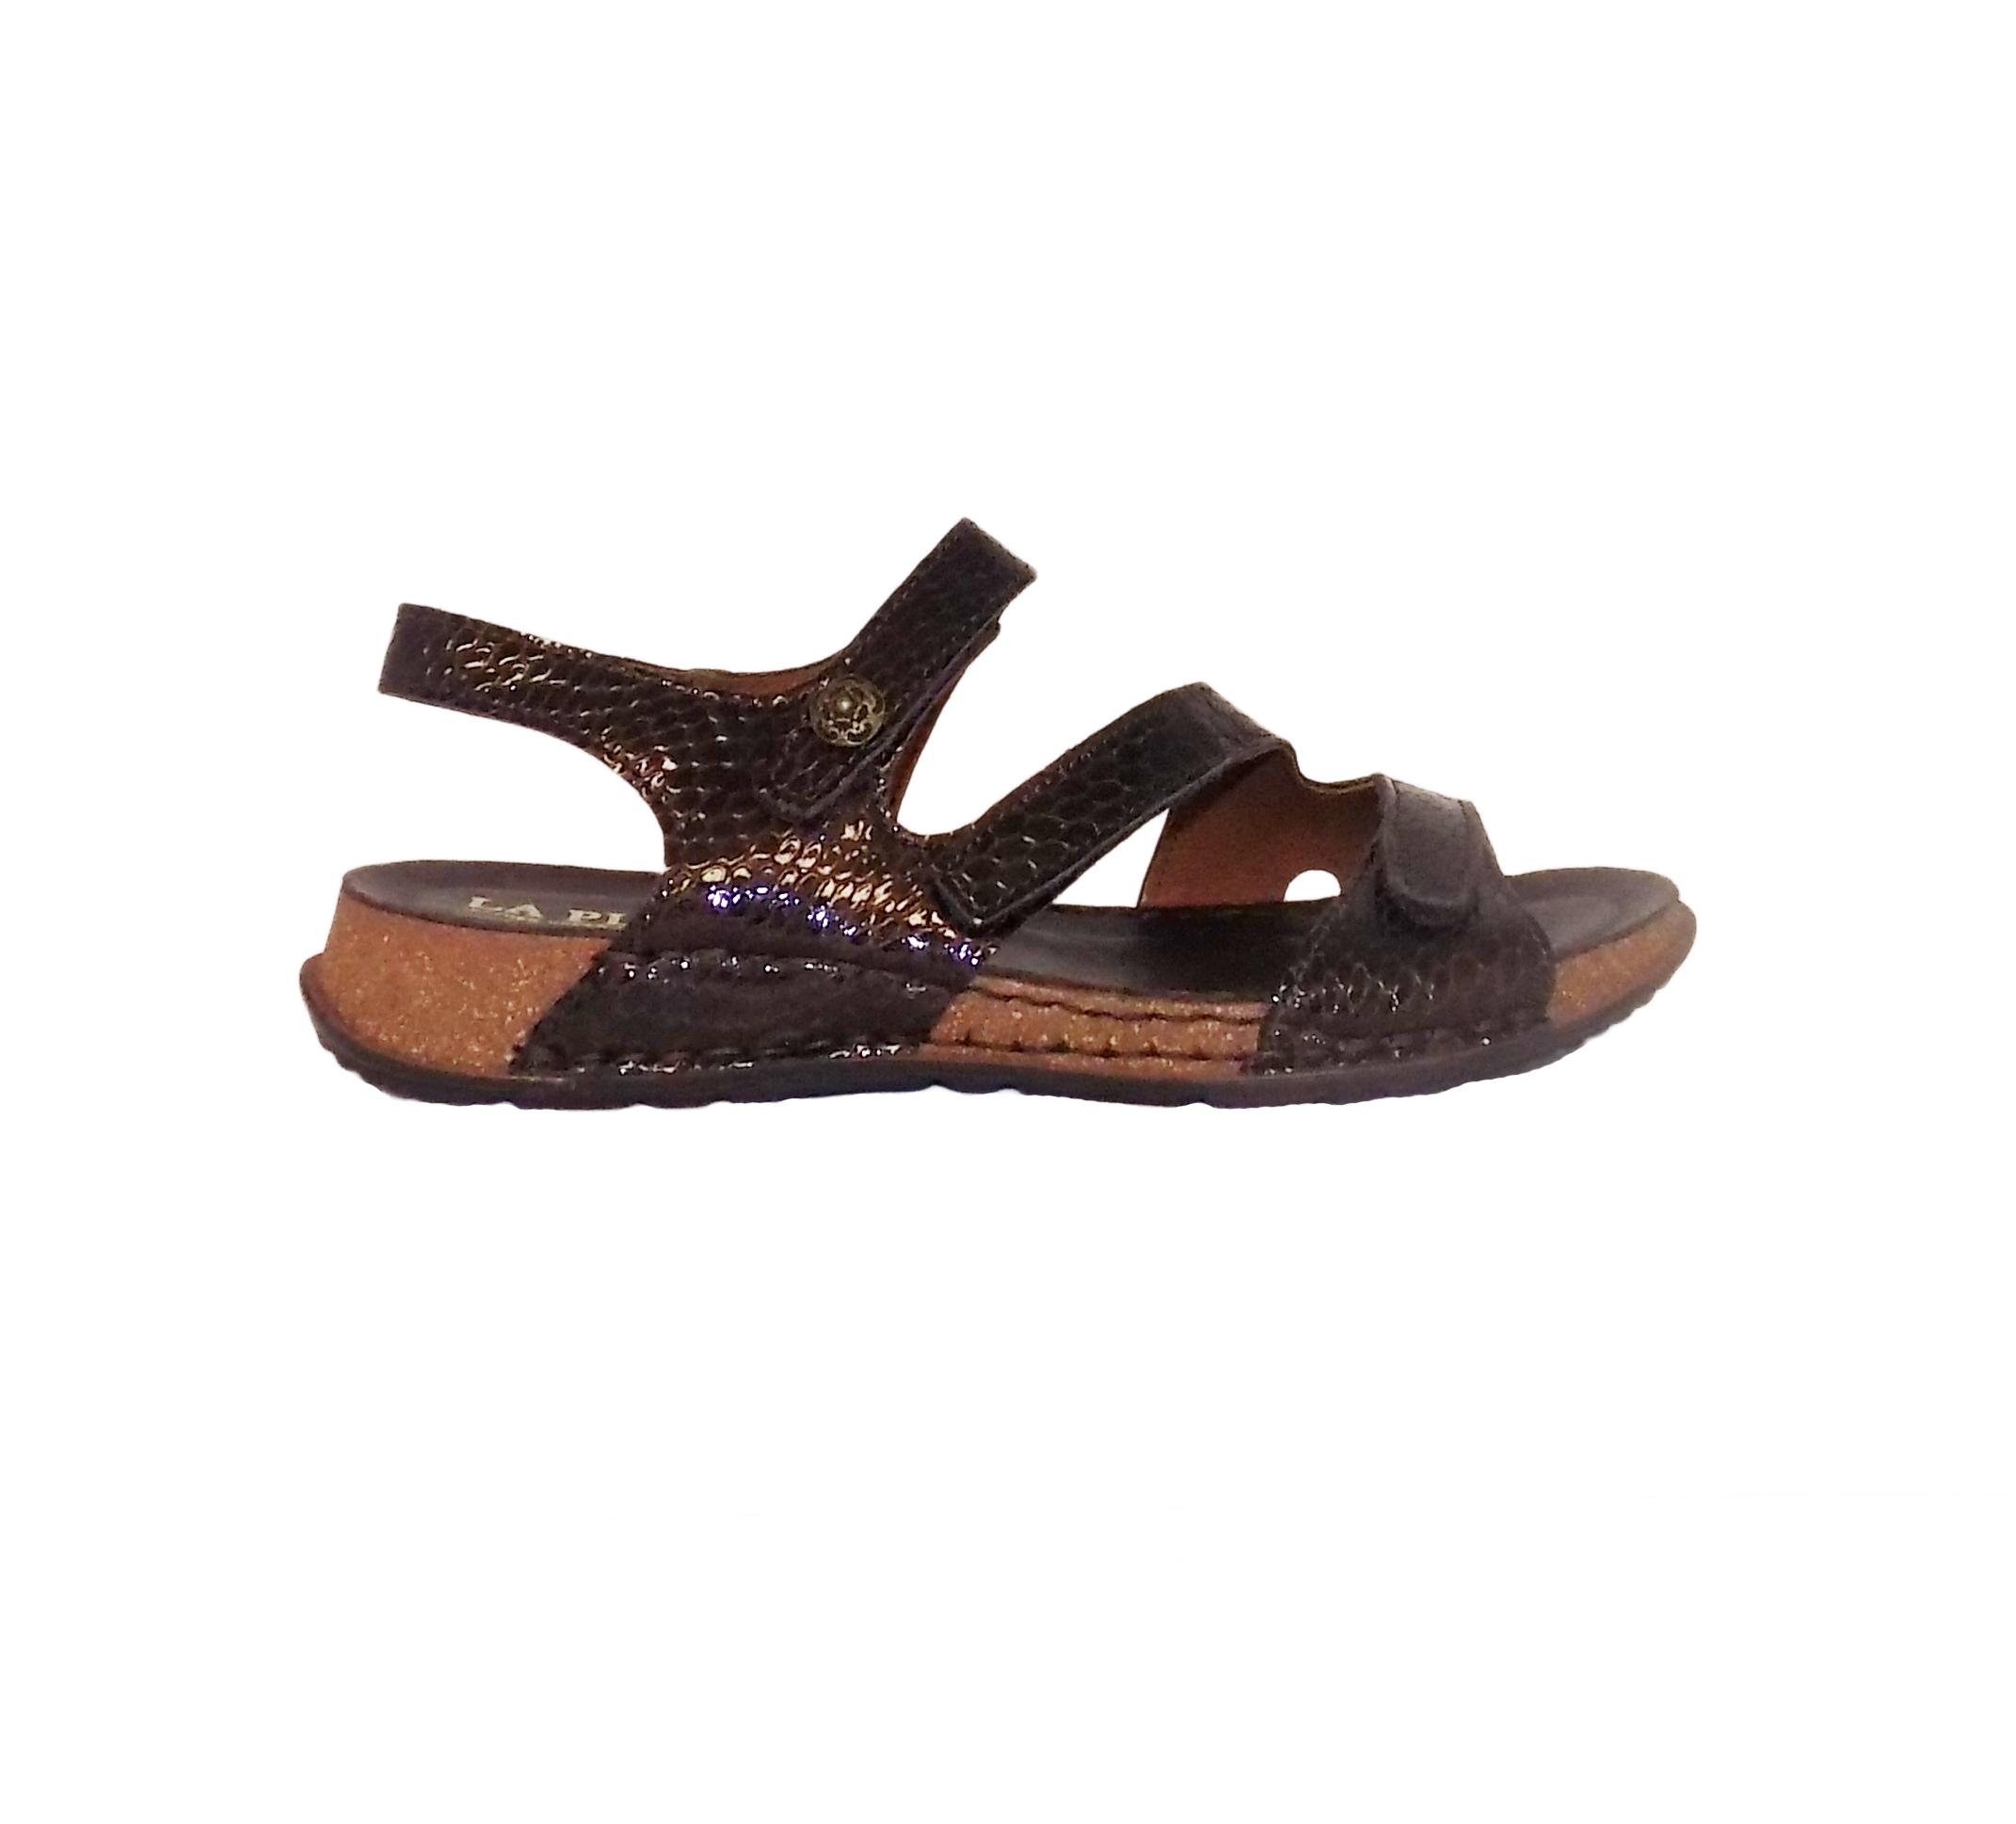 La Plume MAPLE Womens Brown Croc Leather Open Toe Sandals